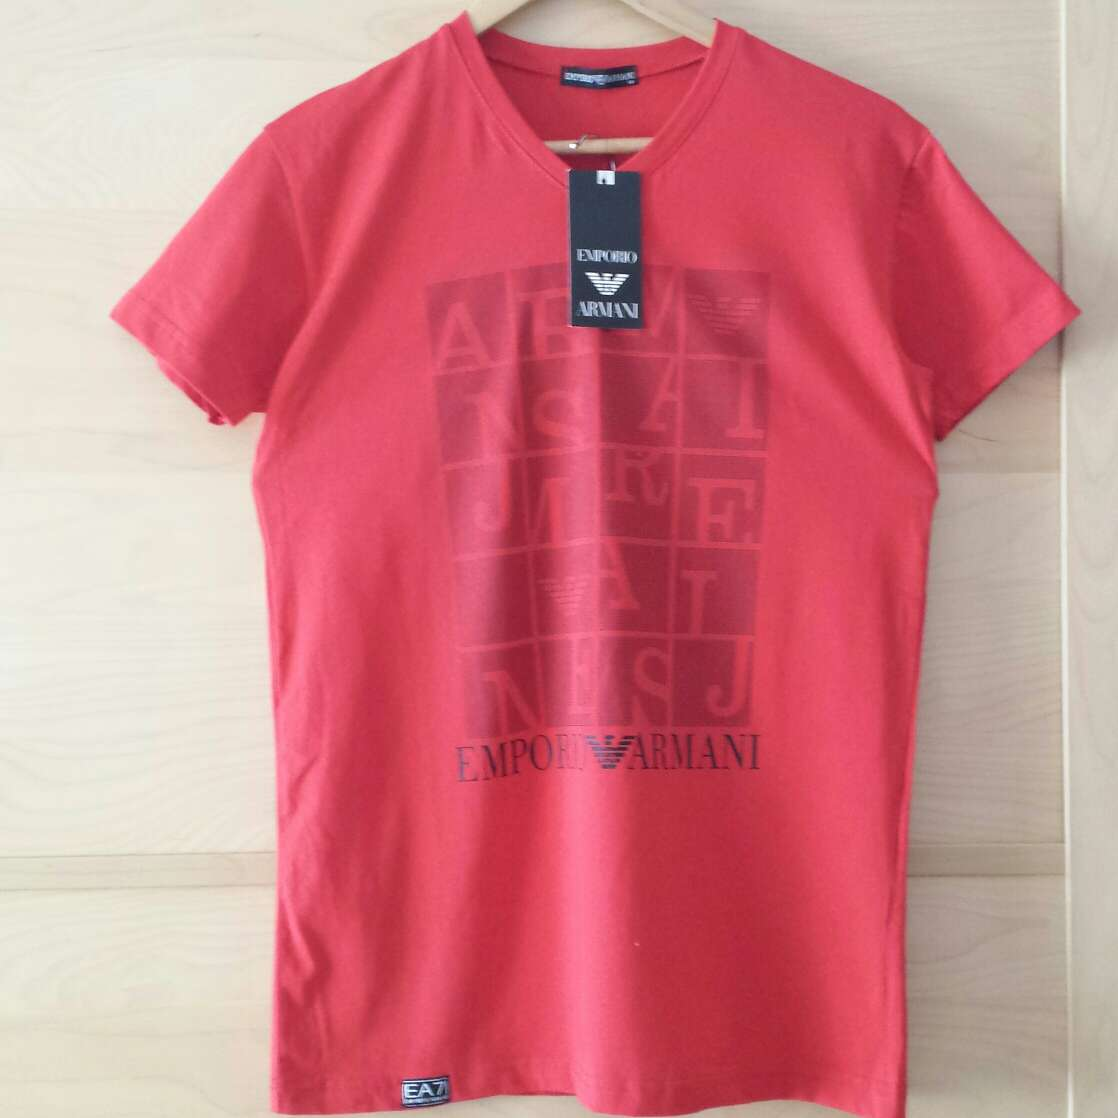 Imagen Camiseta nueva EMPORIO ARMANI